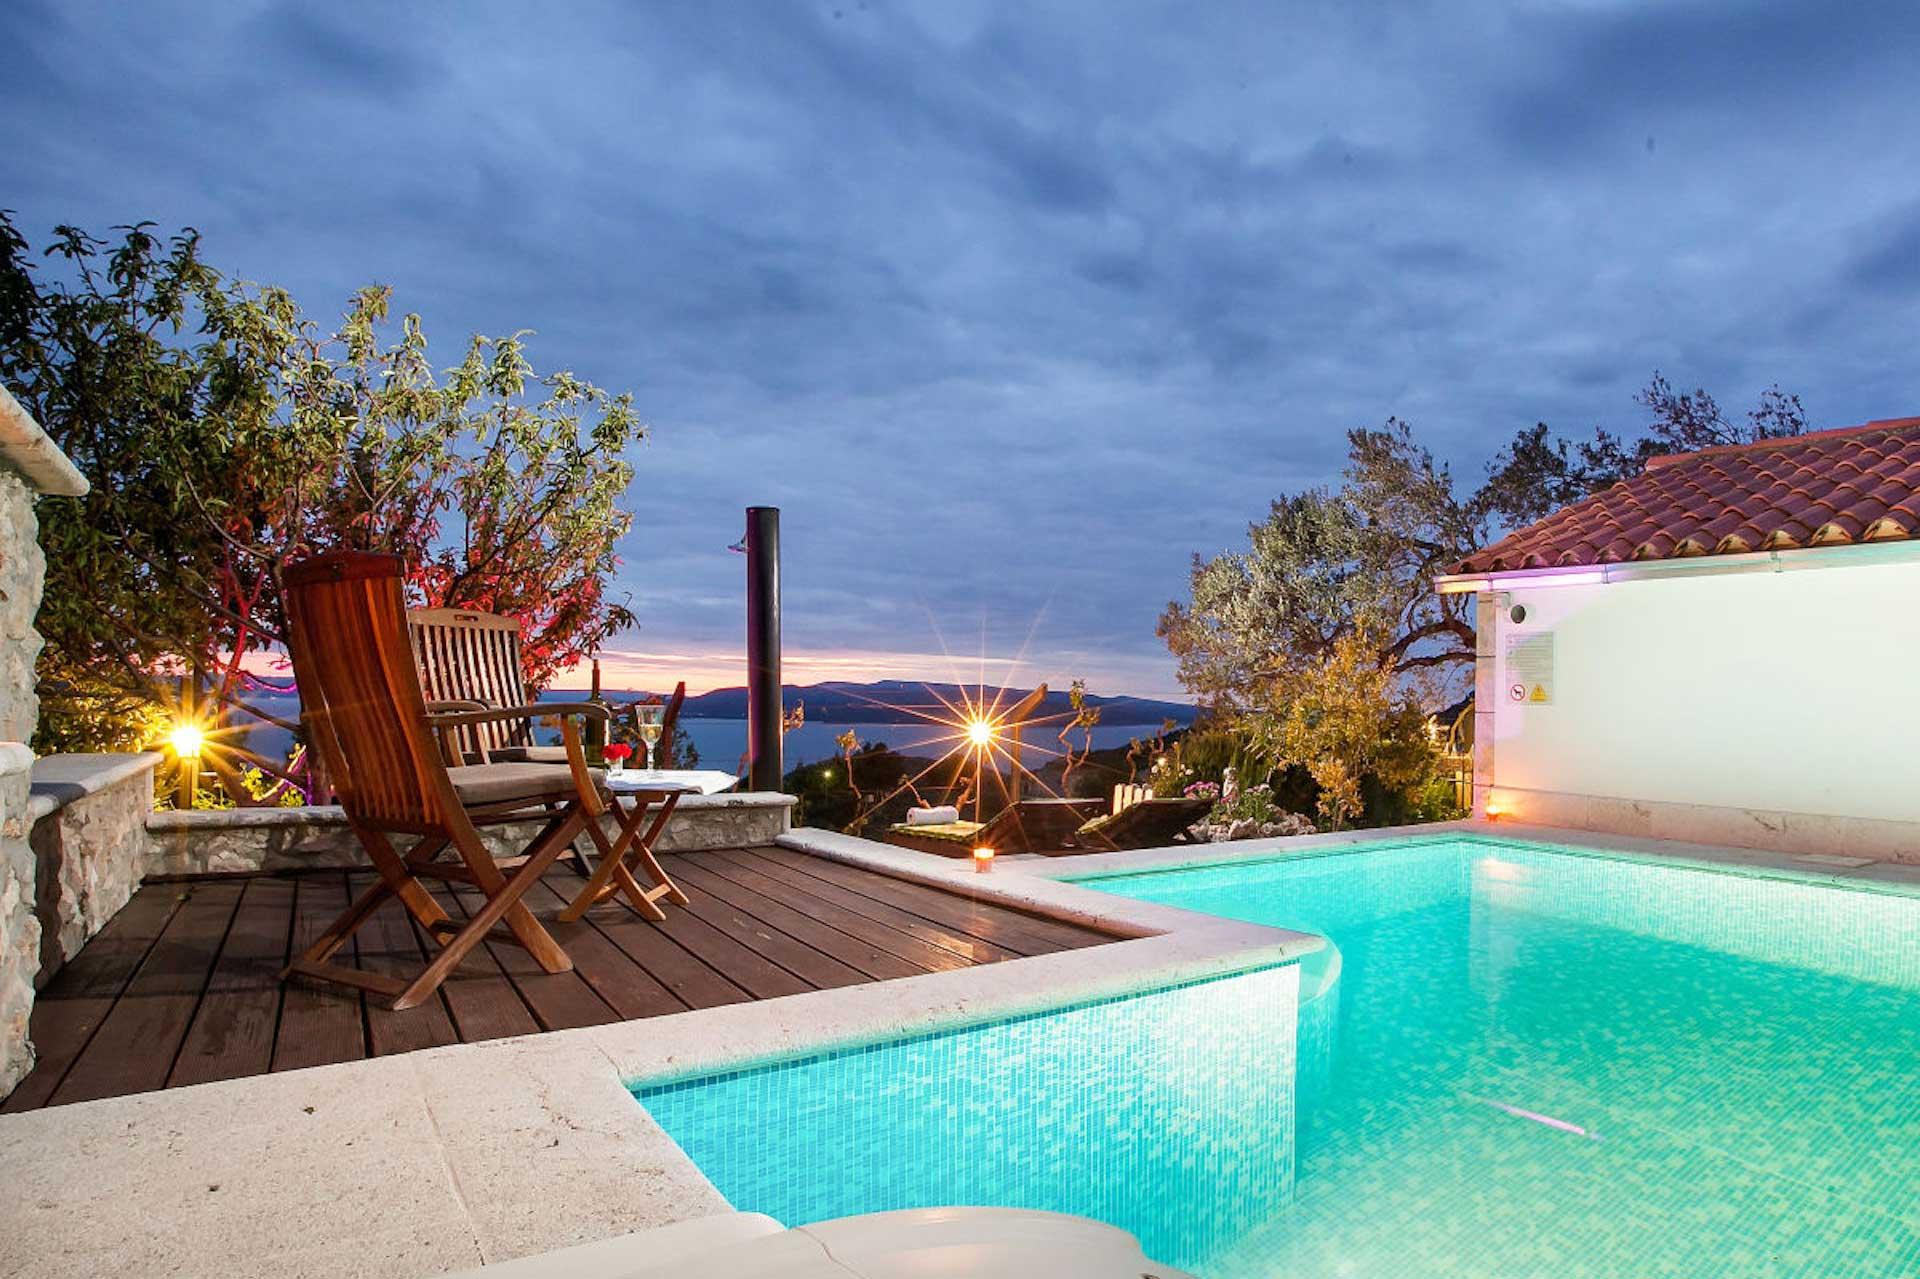 hyra hus i kroatien med pool makarska villa daniela. Black Bedroom Furniture Sets. Home Design Ideas